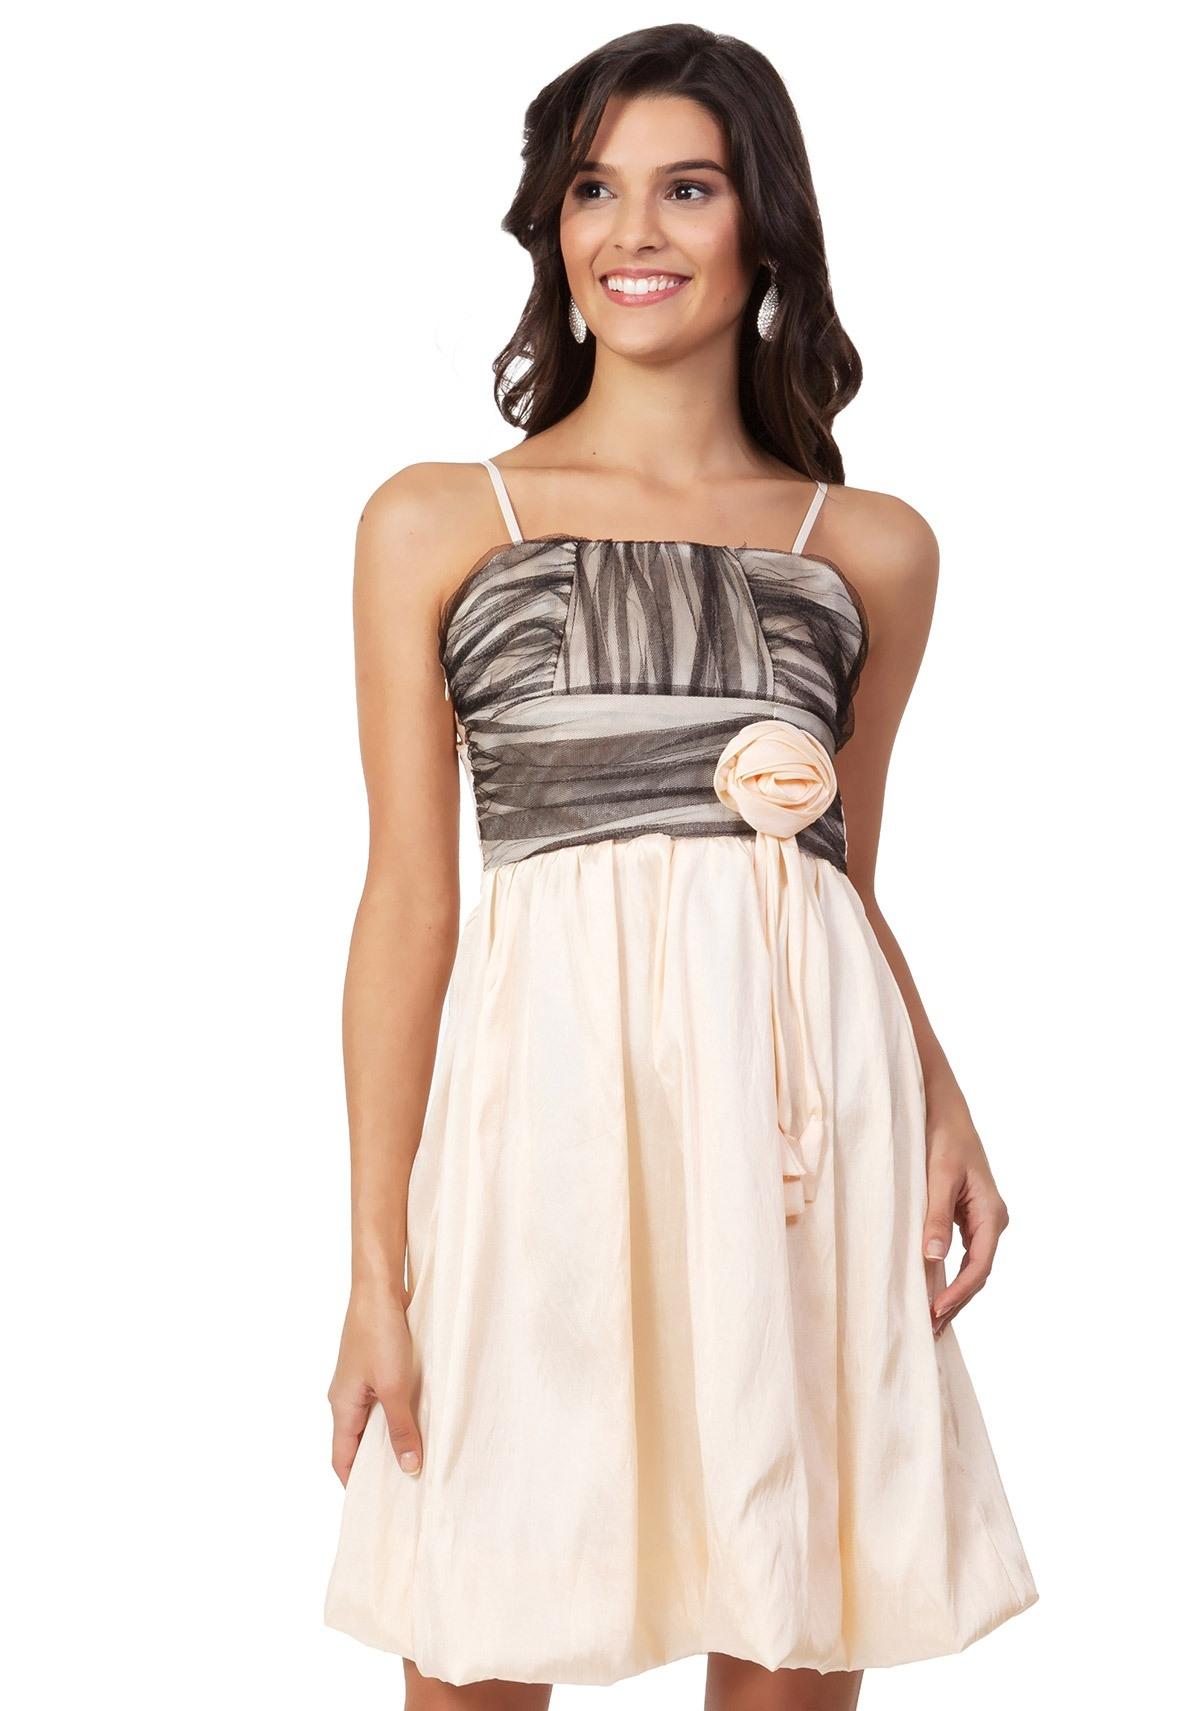 Designer Elegant Günstige Konfirmationskleider StylishAbend Einfach Günstige Konfirmationskleider Stylish